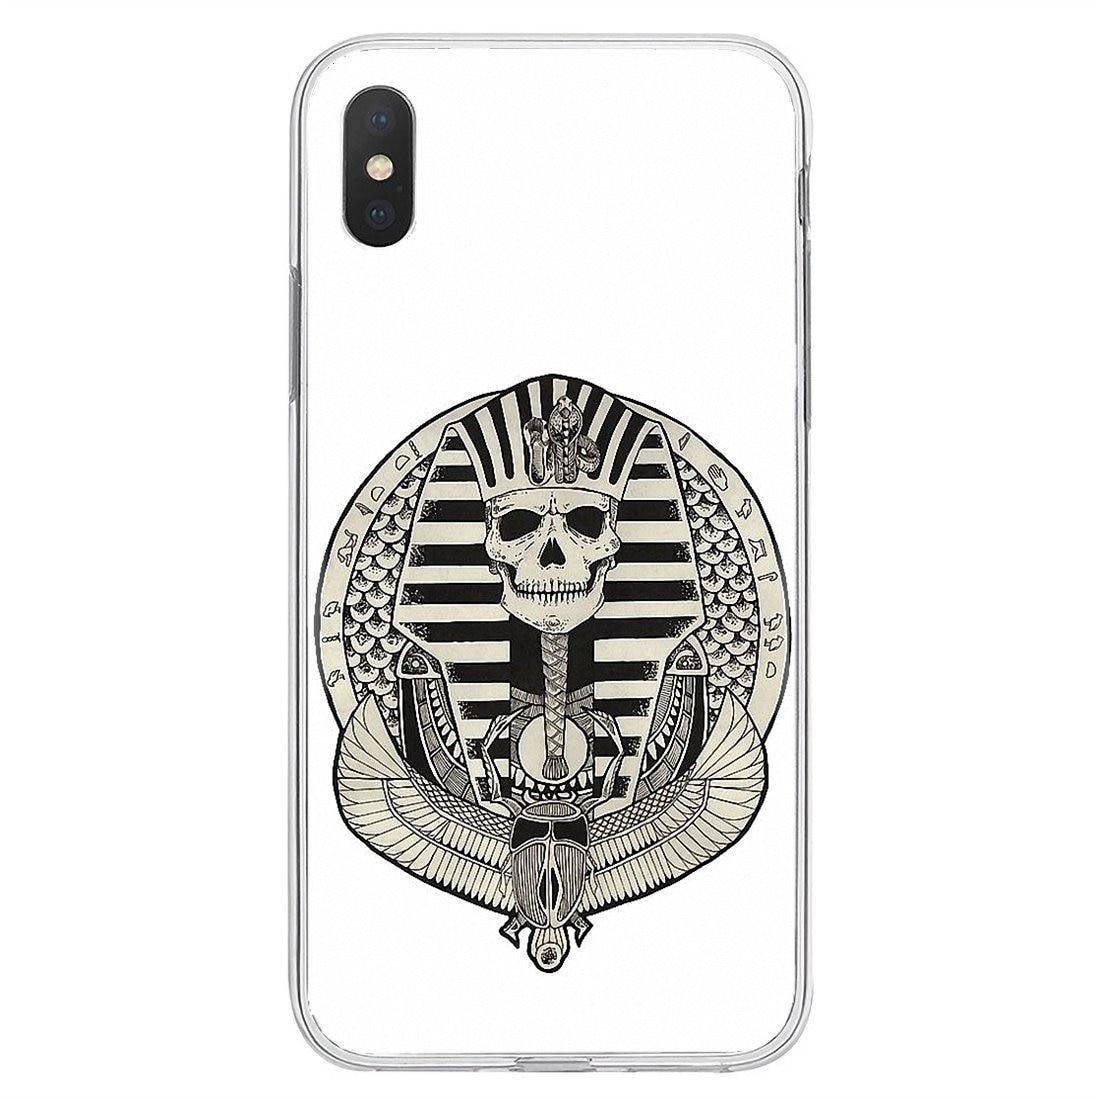 For Xiaomi Redmi 4A S2 Note 3 3S 4 4X 5 Plus 6 7 6A Pro Pocophone F1 Egypt Nefertiti Anubis Ankh Pharaoh Silicone Phone Bag Case